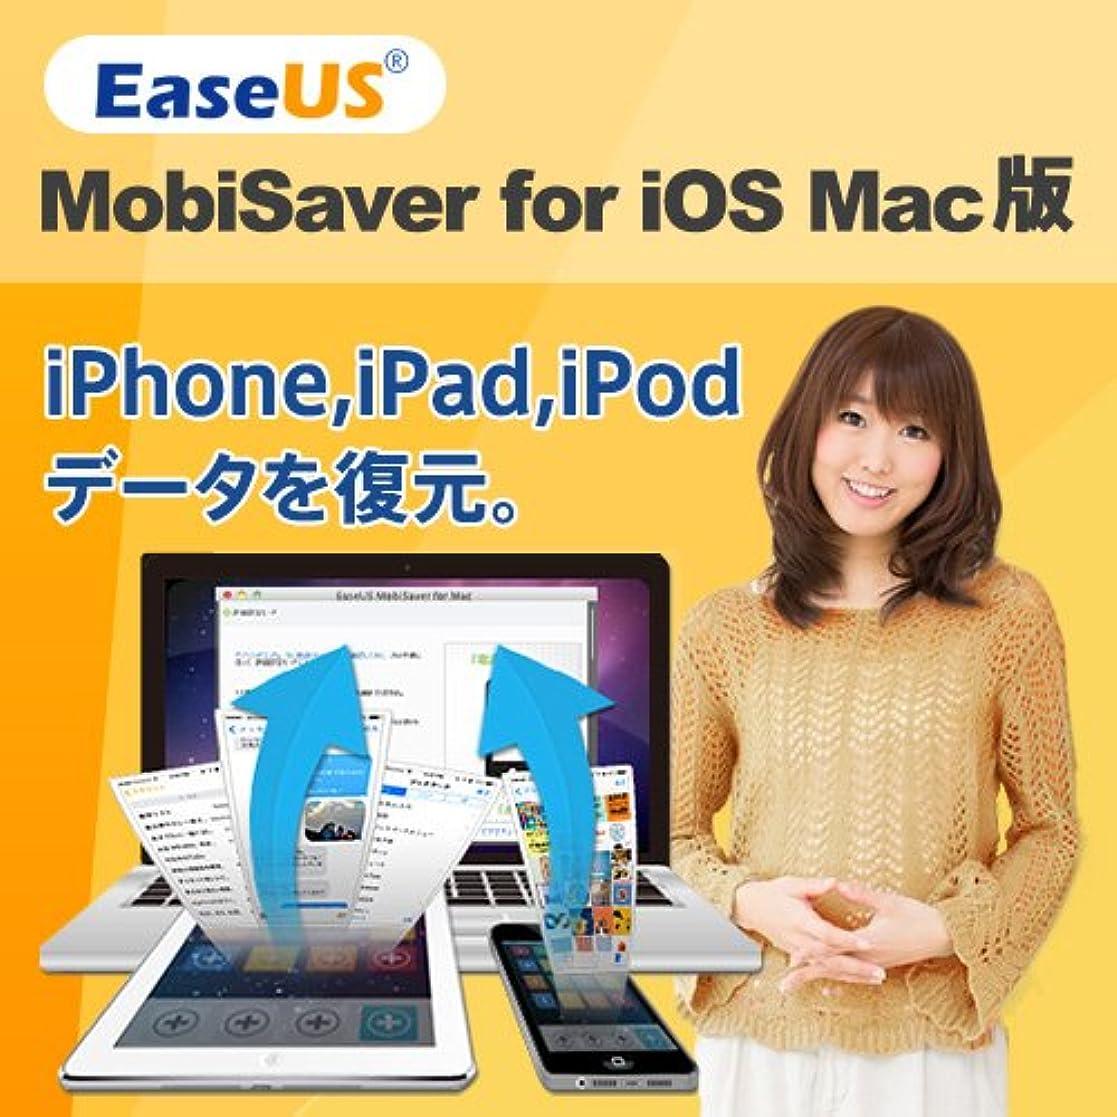 EaseUS MobiSaver for iOS Mac版 [ダウンロード]